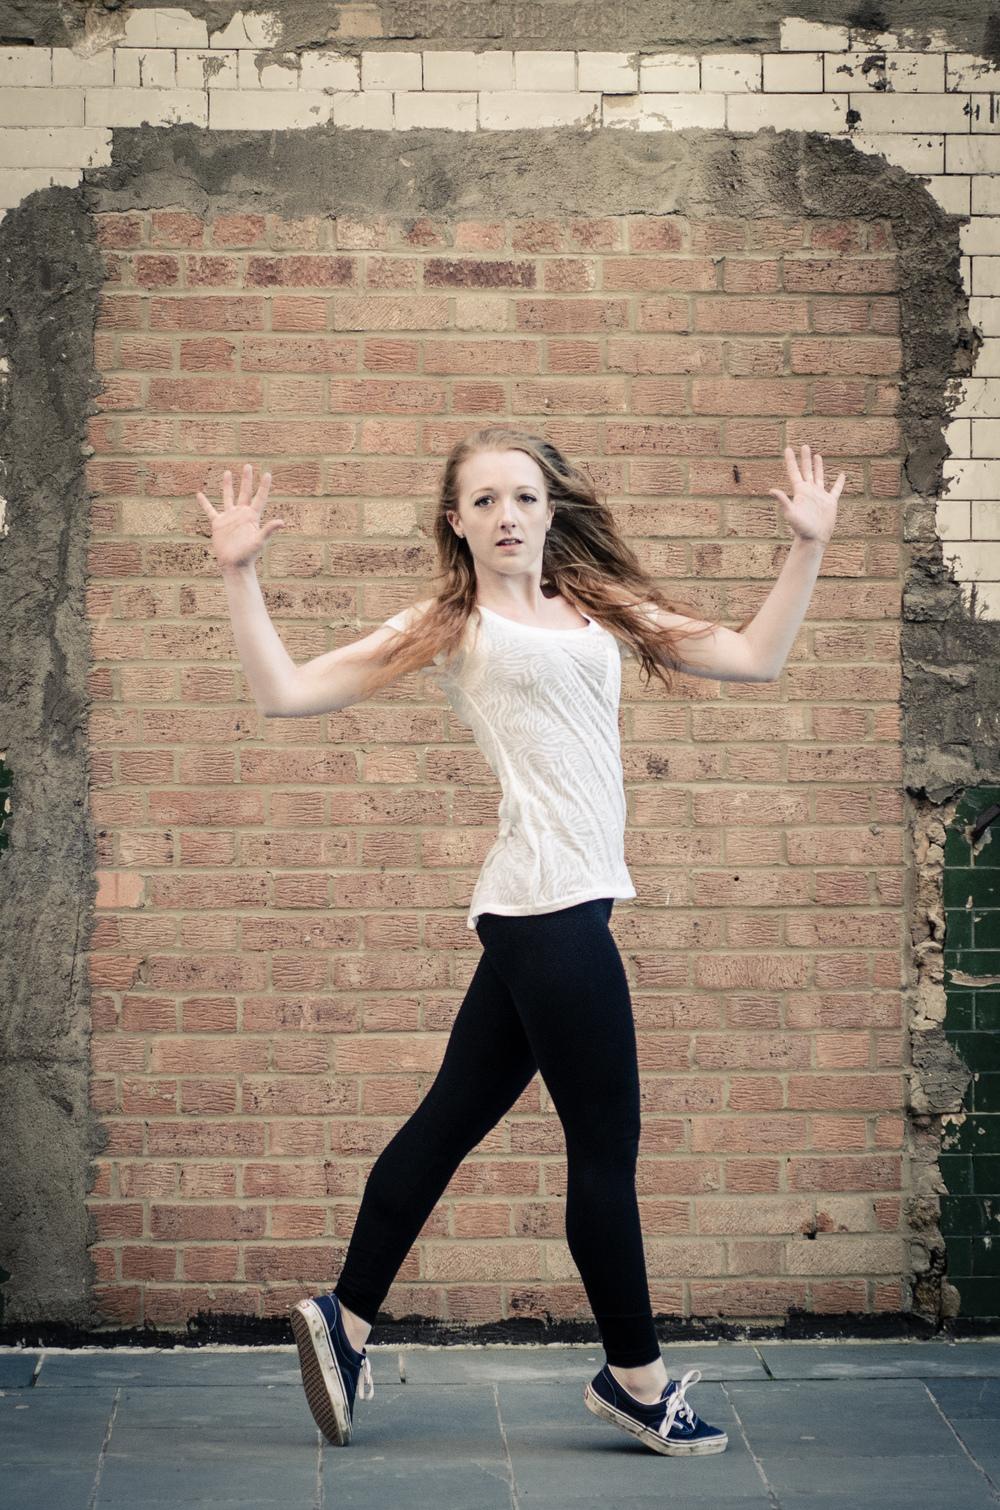 Martha Parkinson - 1st Year Aeronautical Engineer, 15th Year Dancer